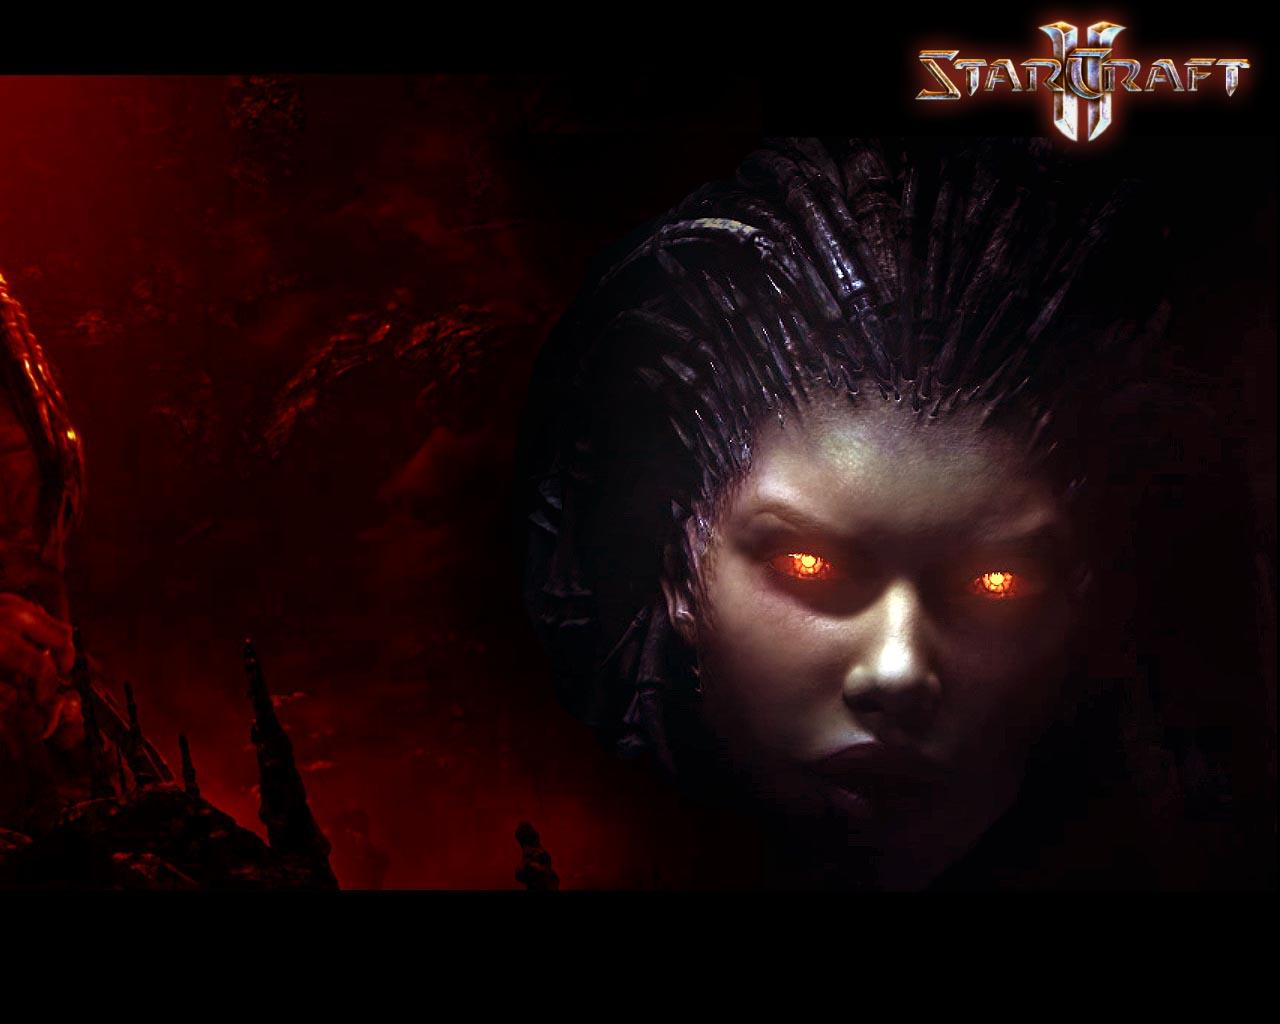 http://2.bp.blogspot.com/-R2wDG9ZE2q8/TvN8tVOnyGI/AAAAAAAAAMw/lLjfhRc1TcA/s1600/StarCraft-2-1280x1024-3-wallpaper-by-iGameLover-gamesphilosophy.com_.jpg